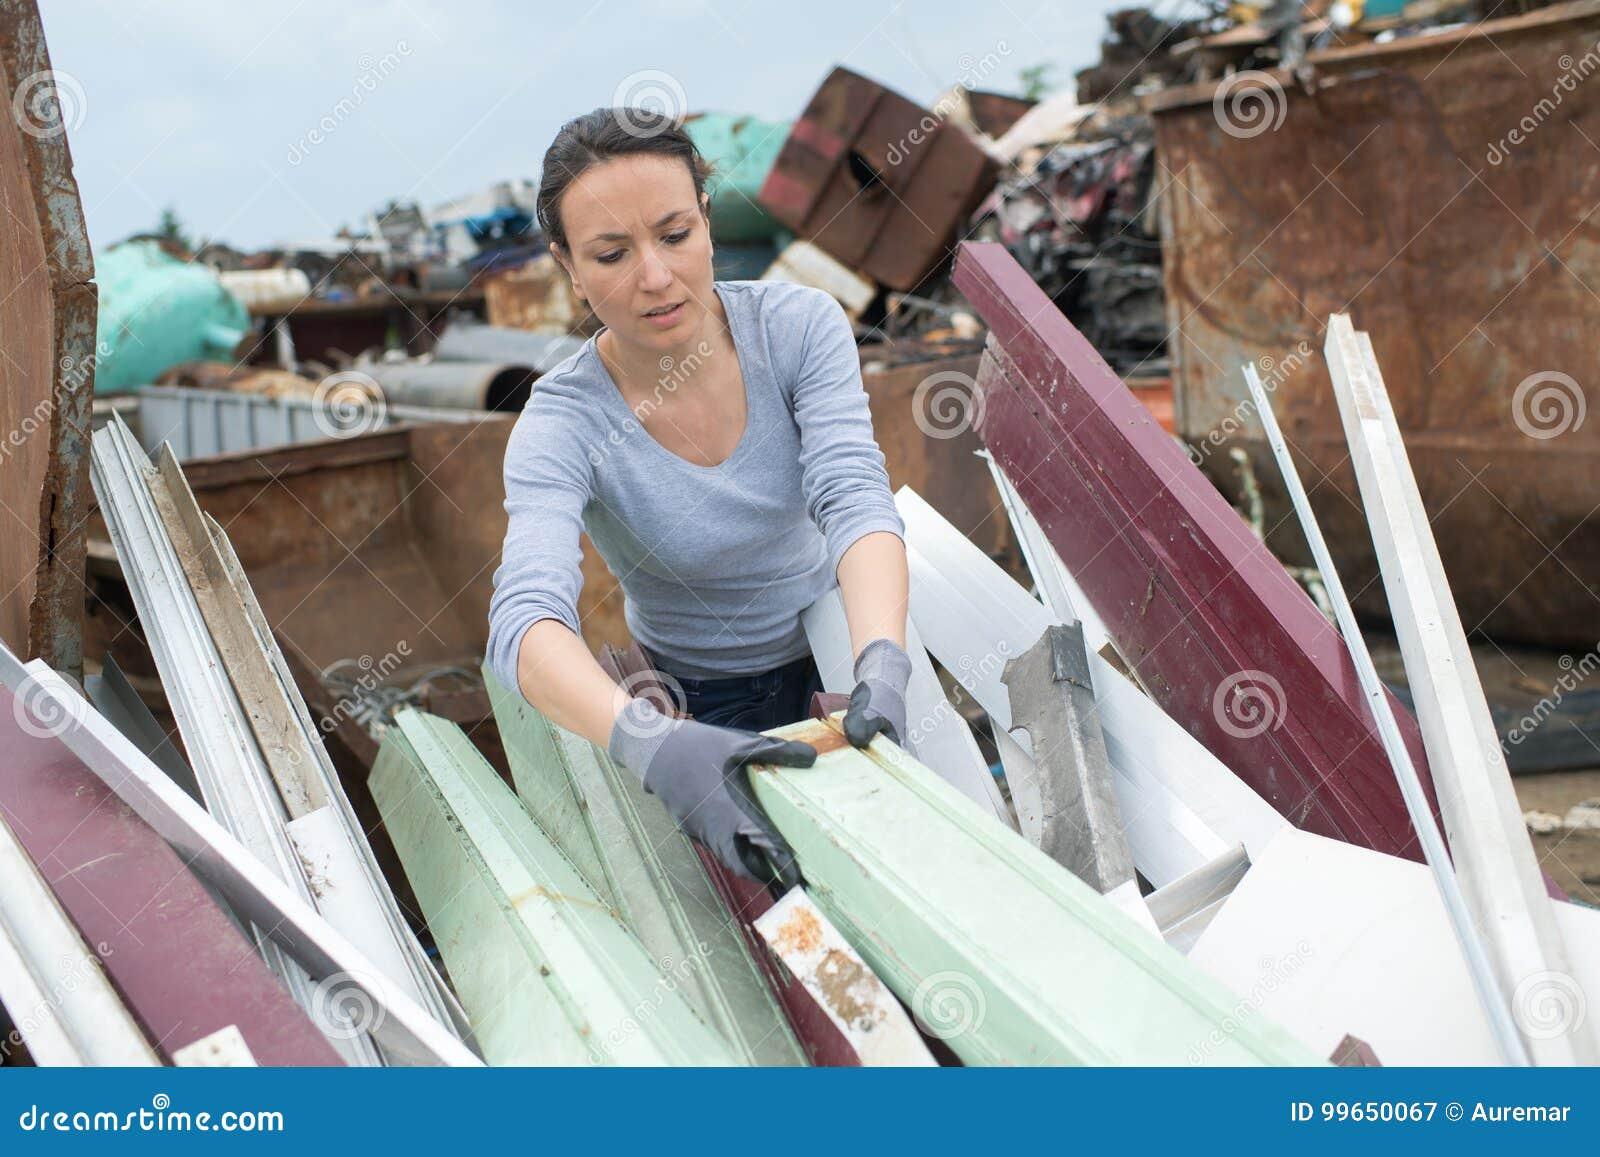 Woman landfill employee working in skip